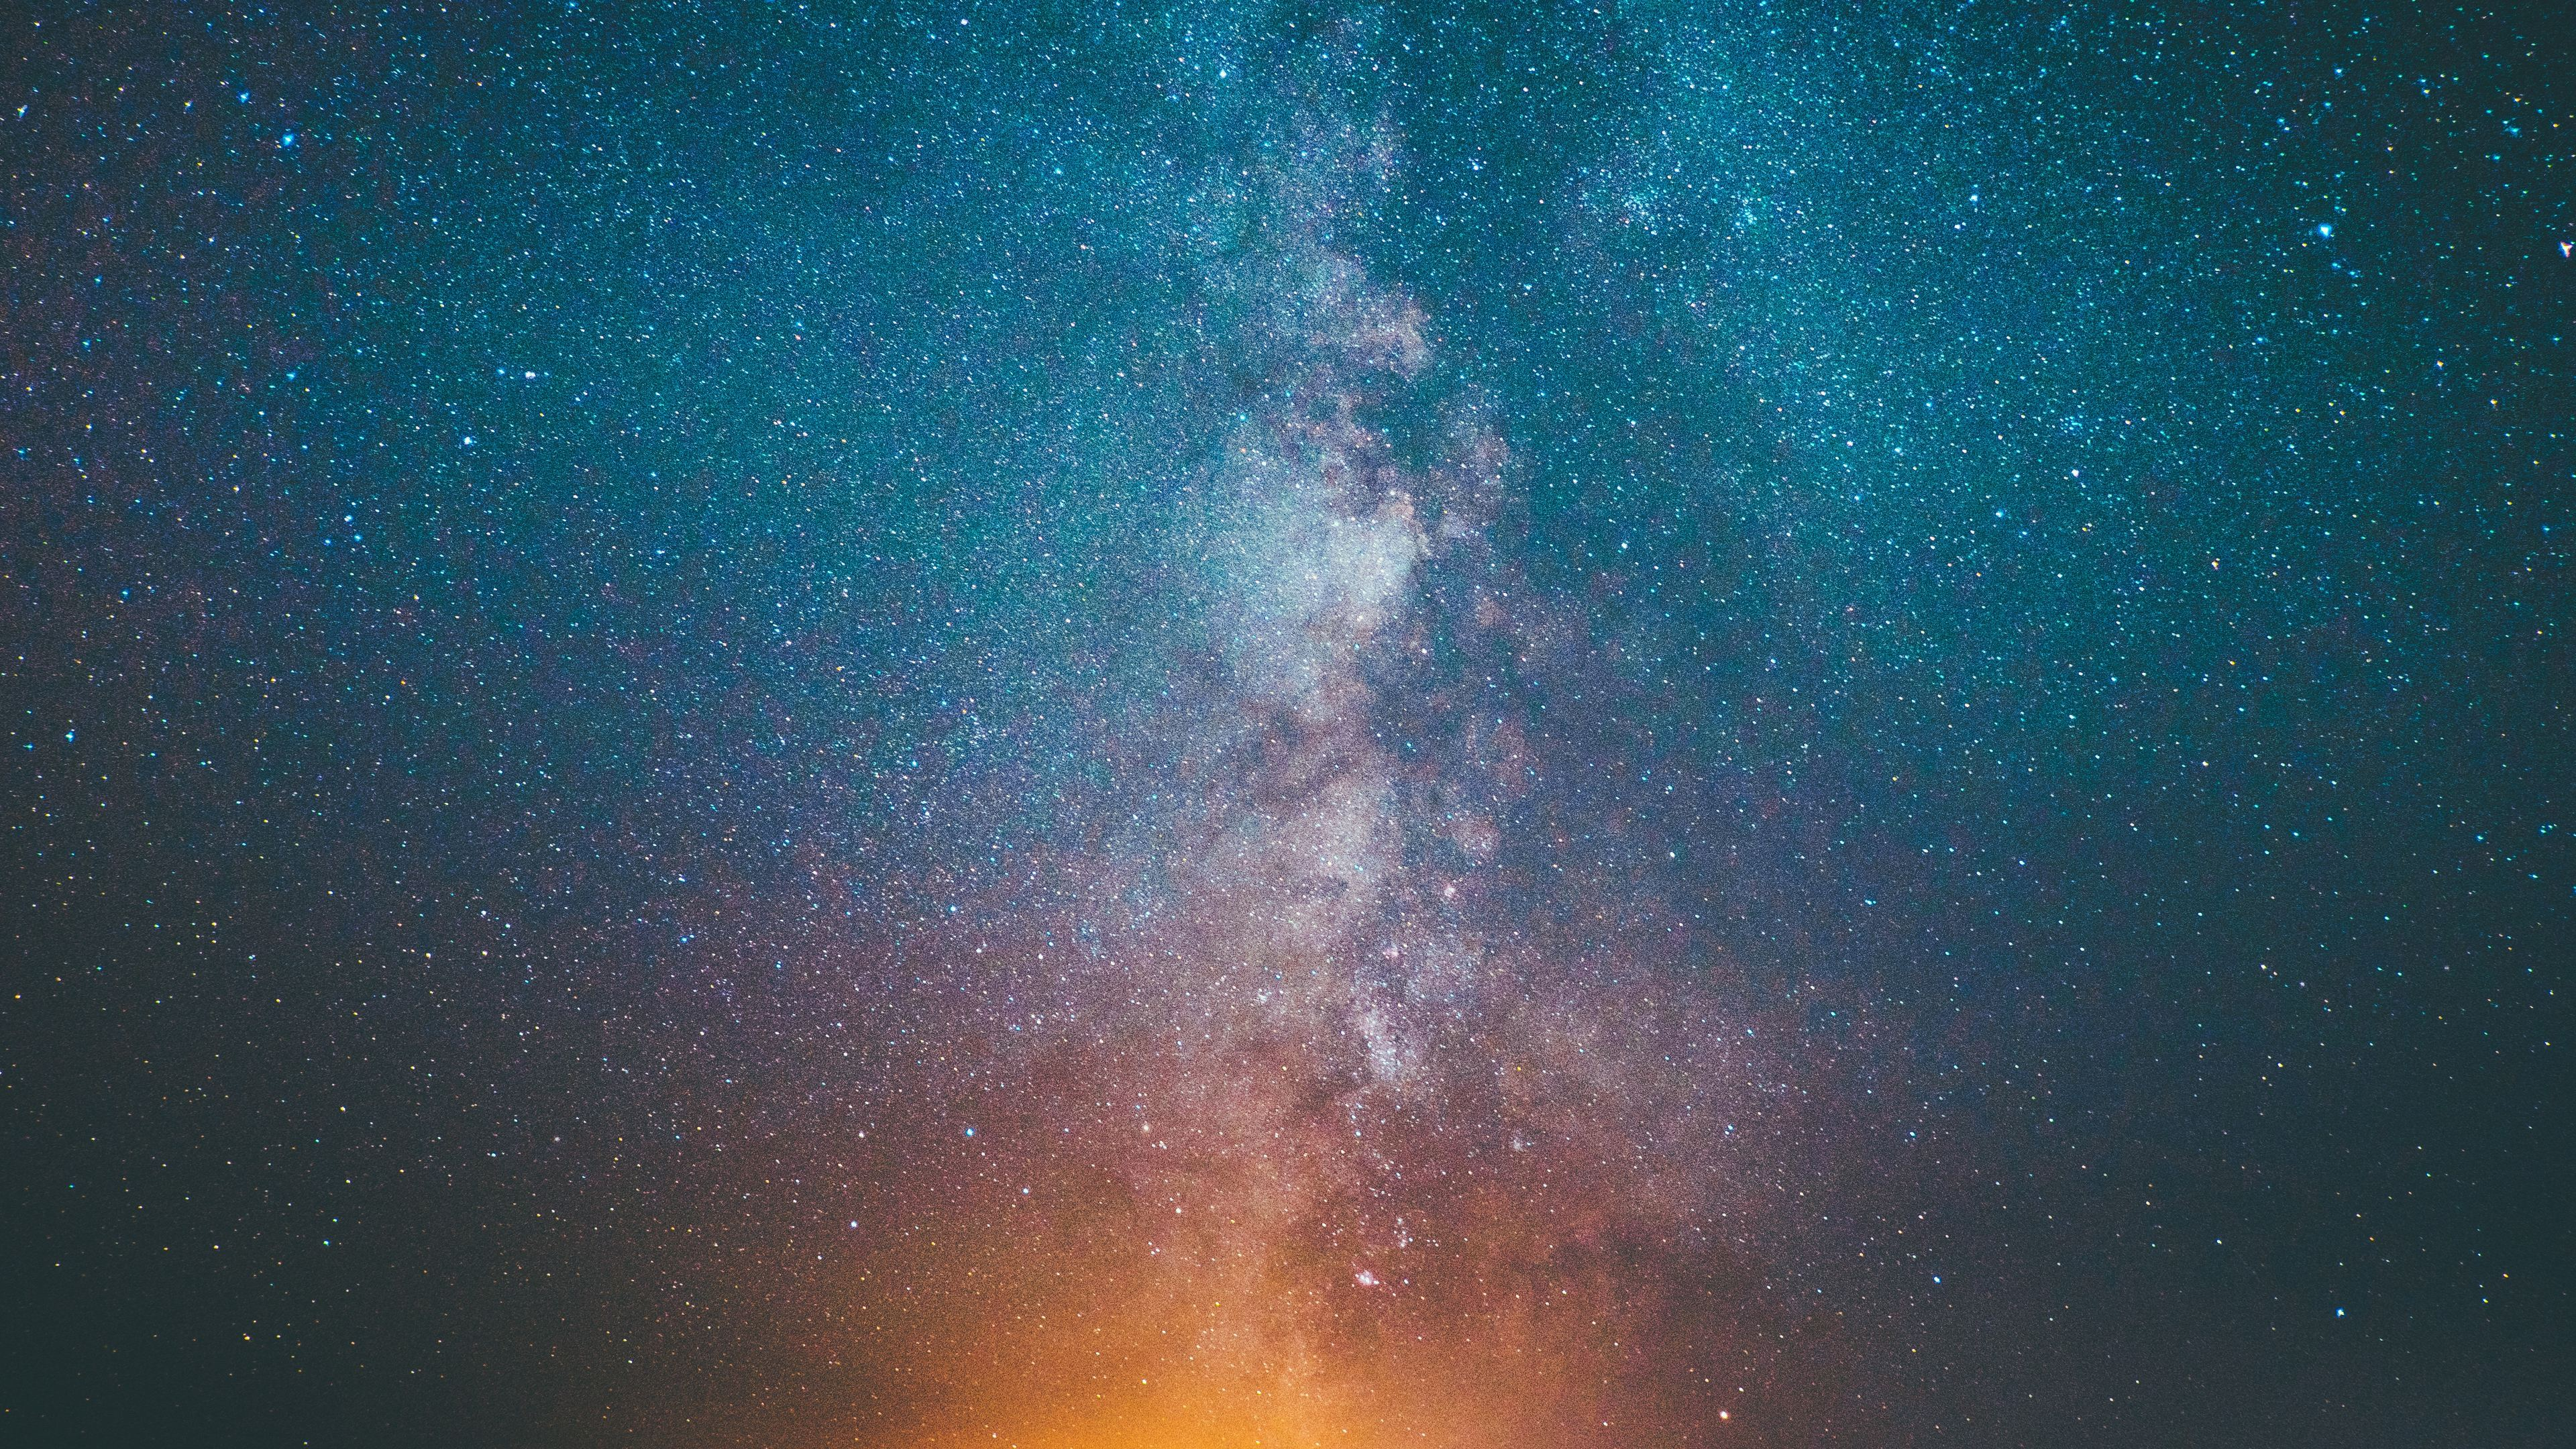 5k milky way 1540140927 - 5k Milky Way - universe wallpapers, stars wallpapers, scifi wallpapers, photography wallpapers, milky way wallpapers, hd-wallpapers, digital universe wallpapers, 5k wallpapers, 4k-wallpapers